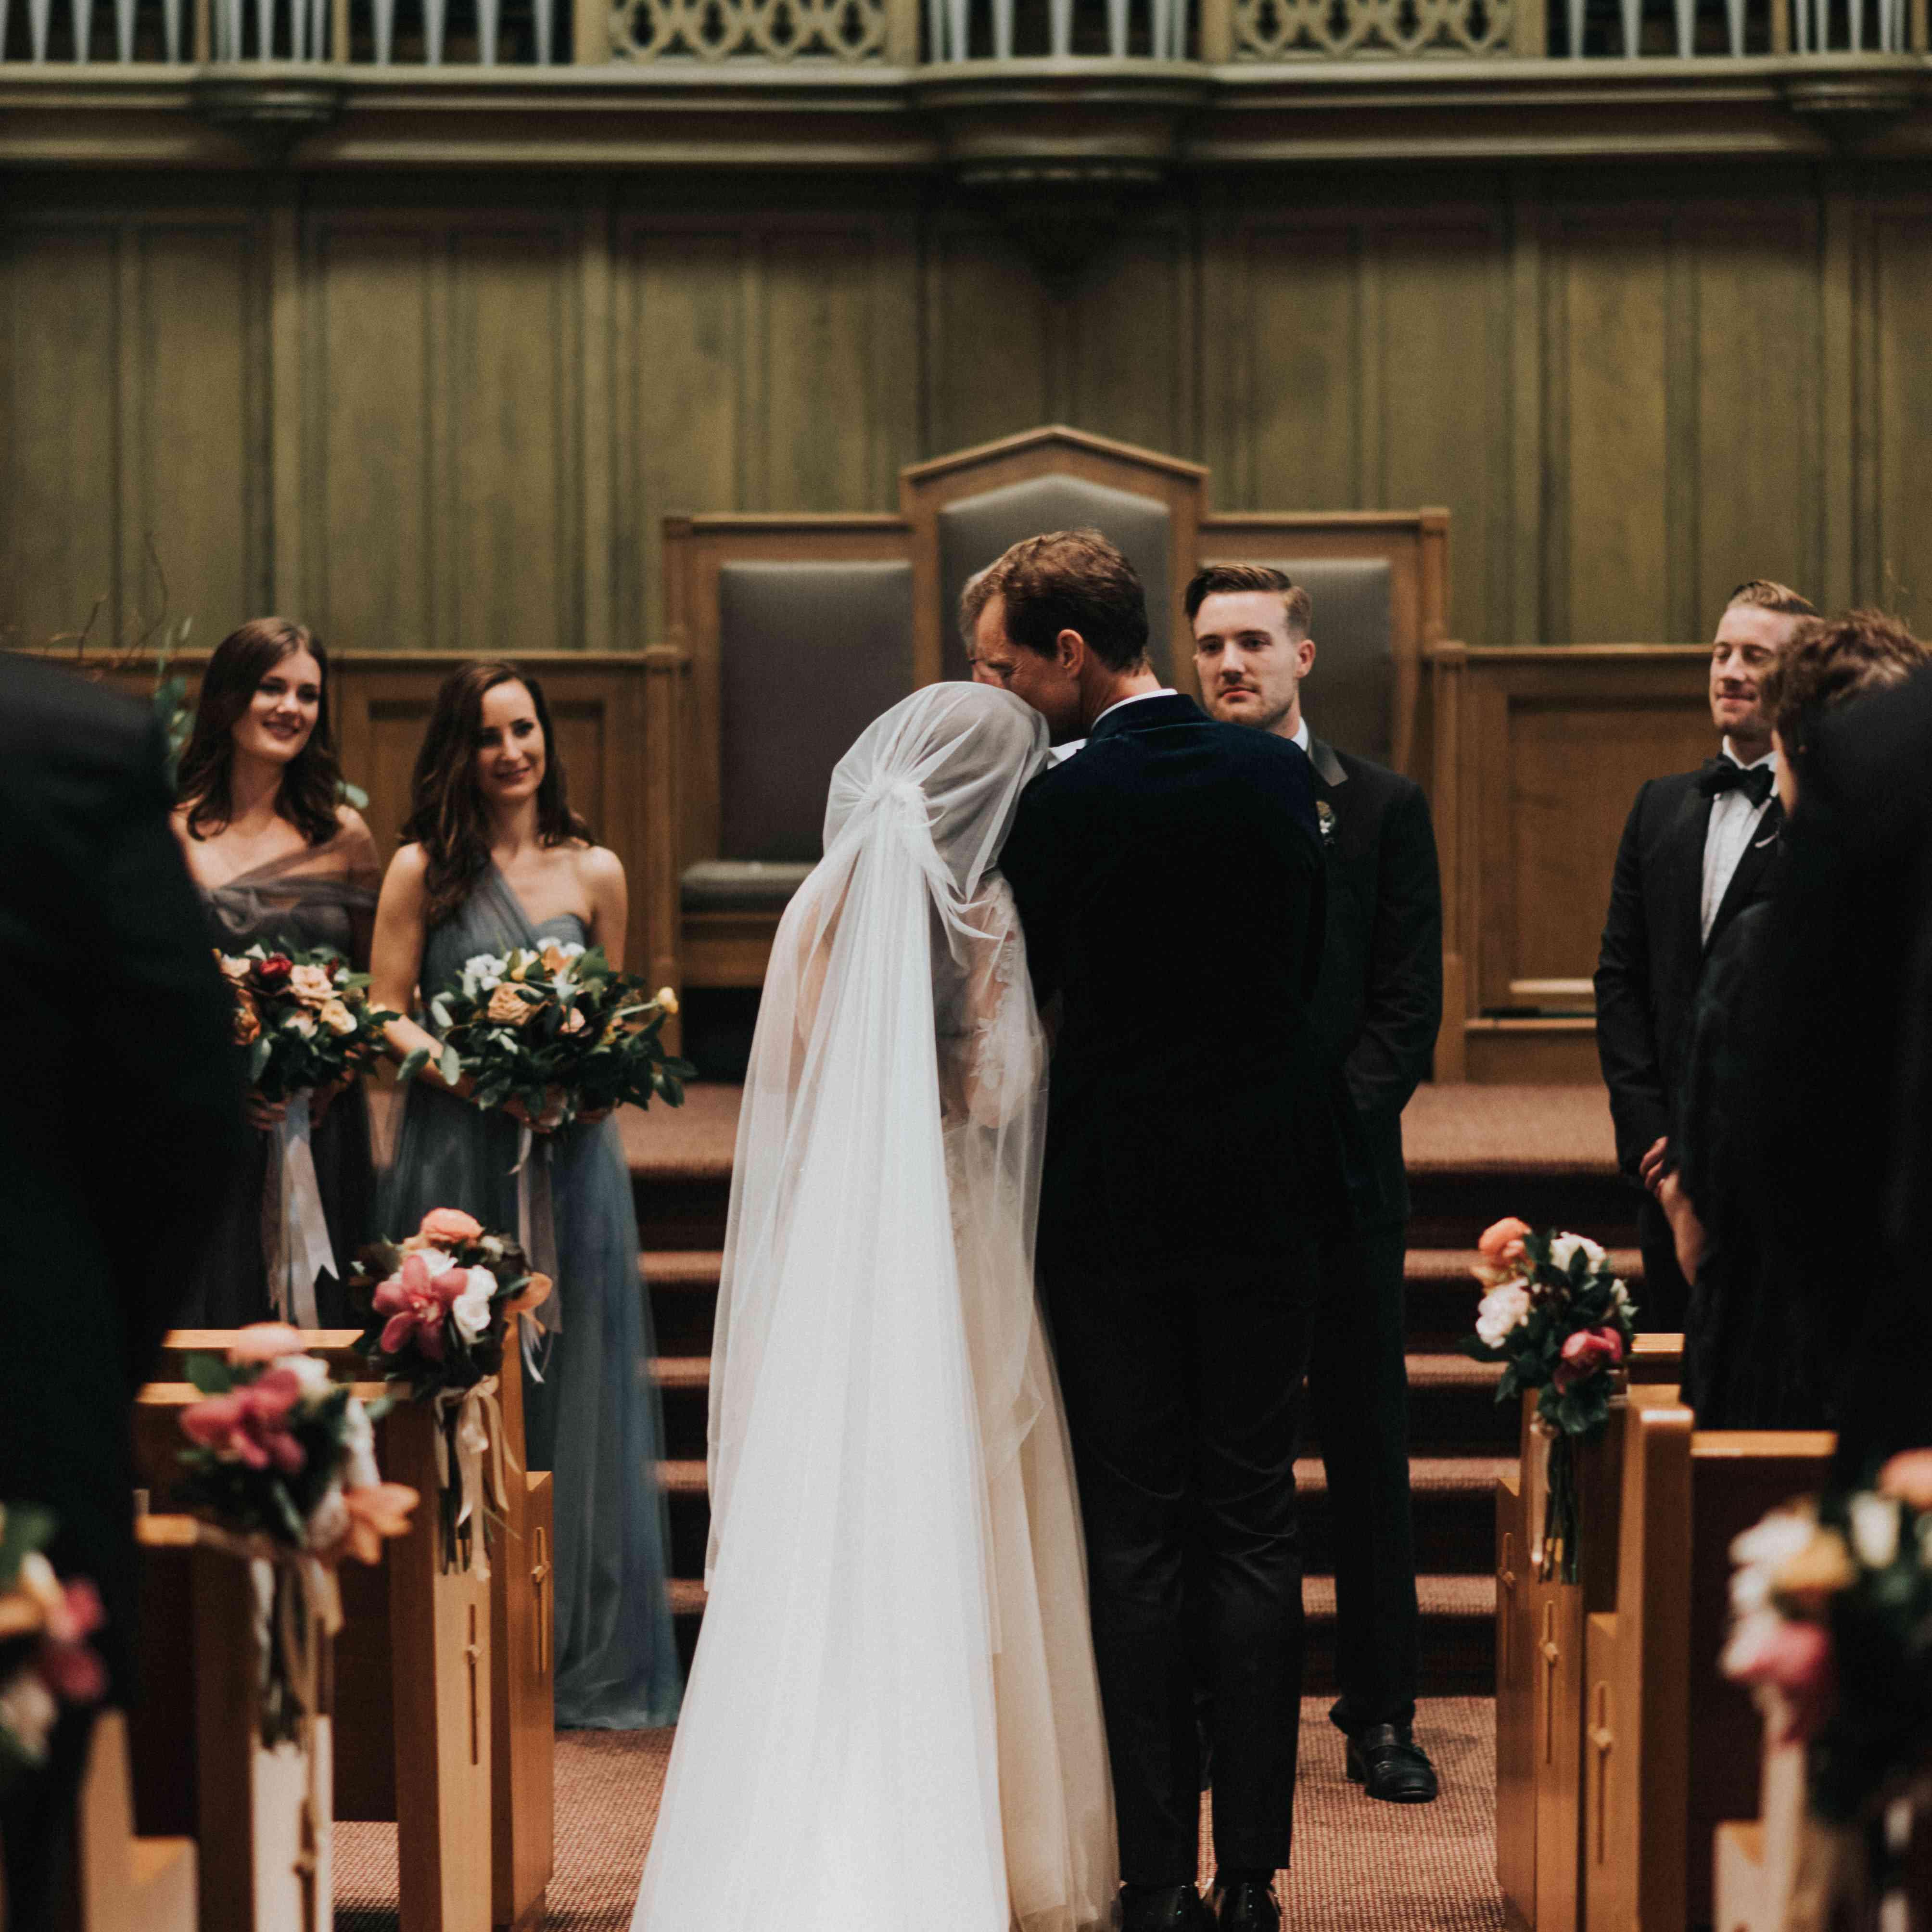 personalized michgan wedding, bride and groom at church altar